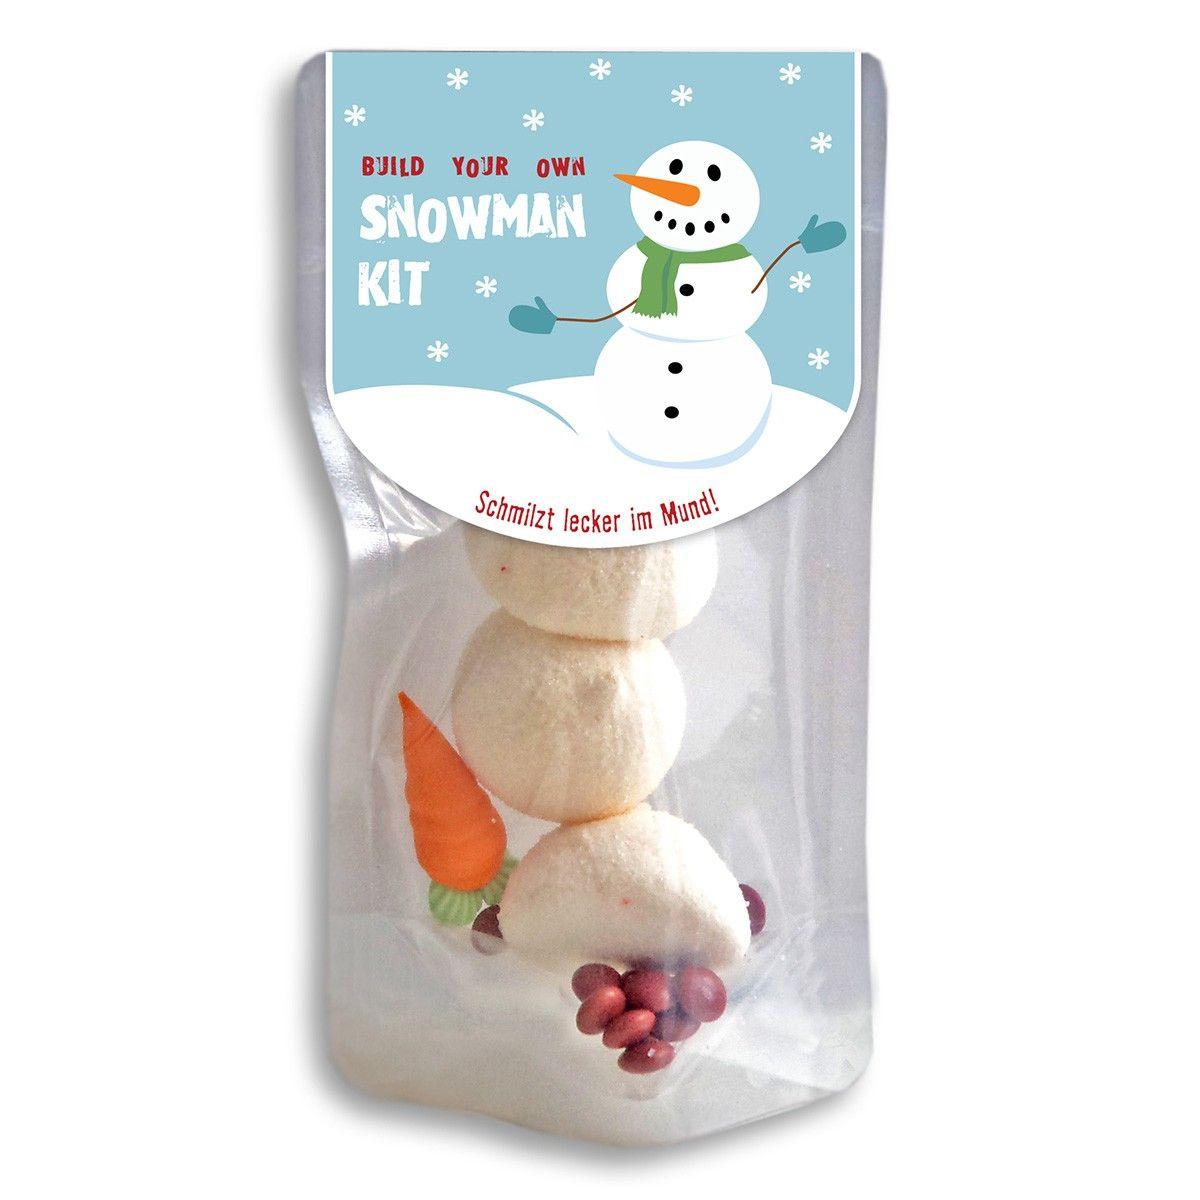 snowman kit bau dir 39 nen schneemann aus schaumzucker diy pinterest weihnachten. Black Bedroom Furniture Sets. Home Design Ideas